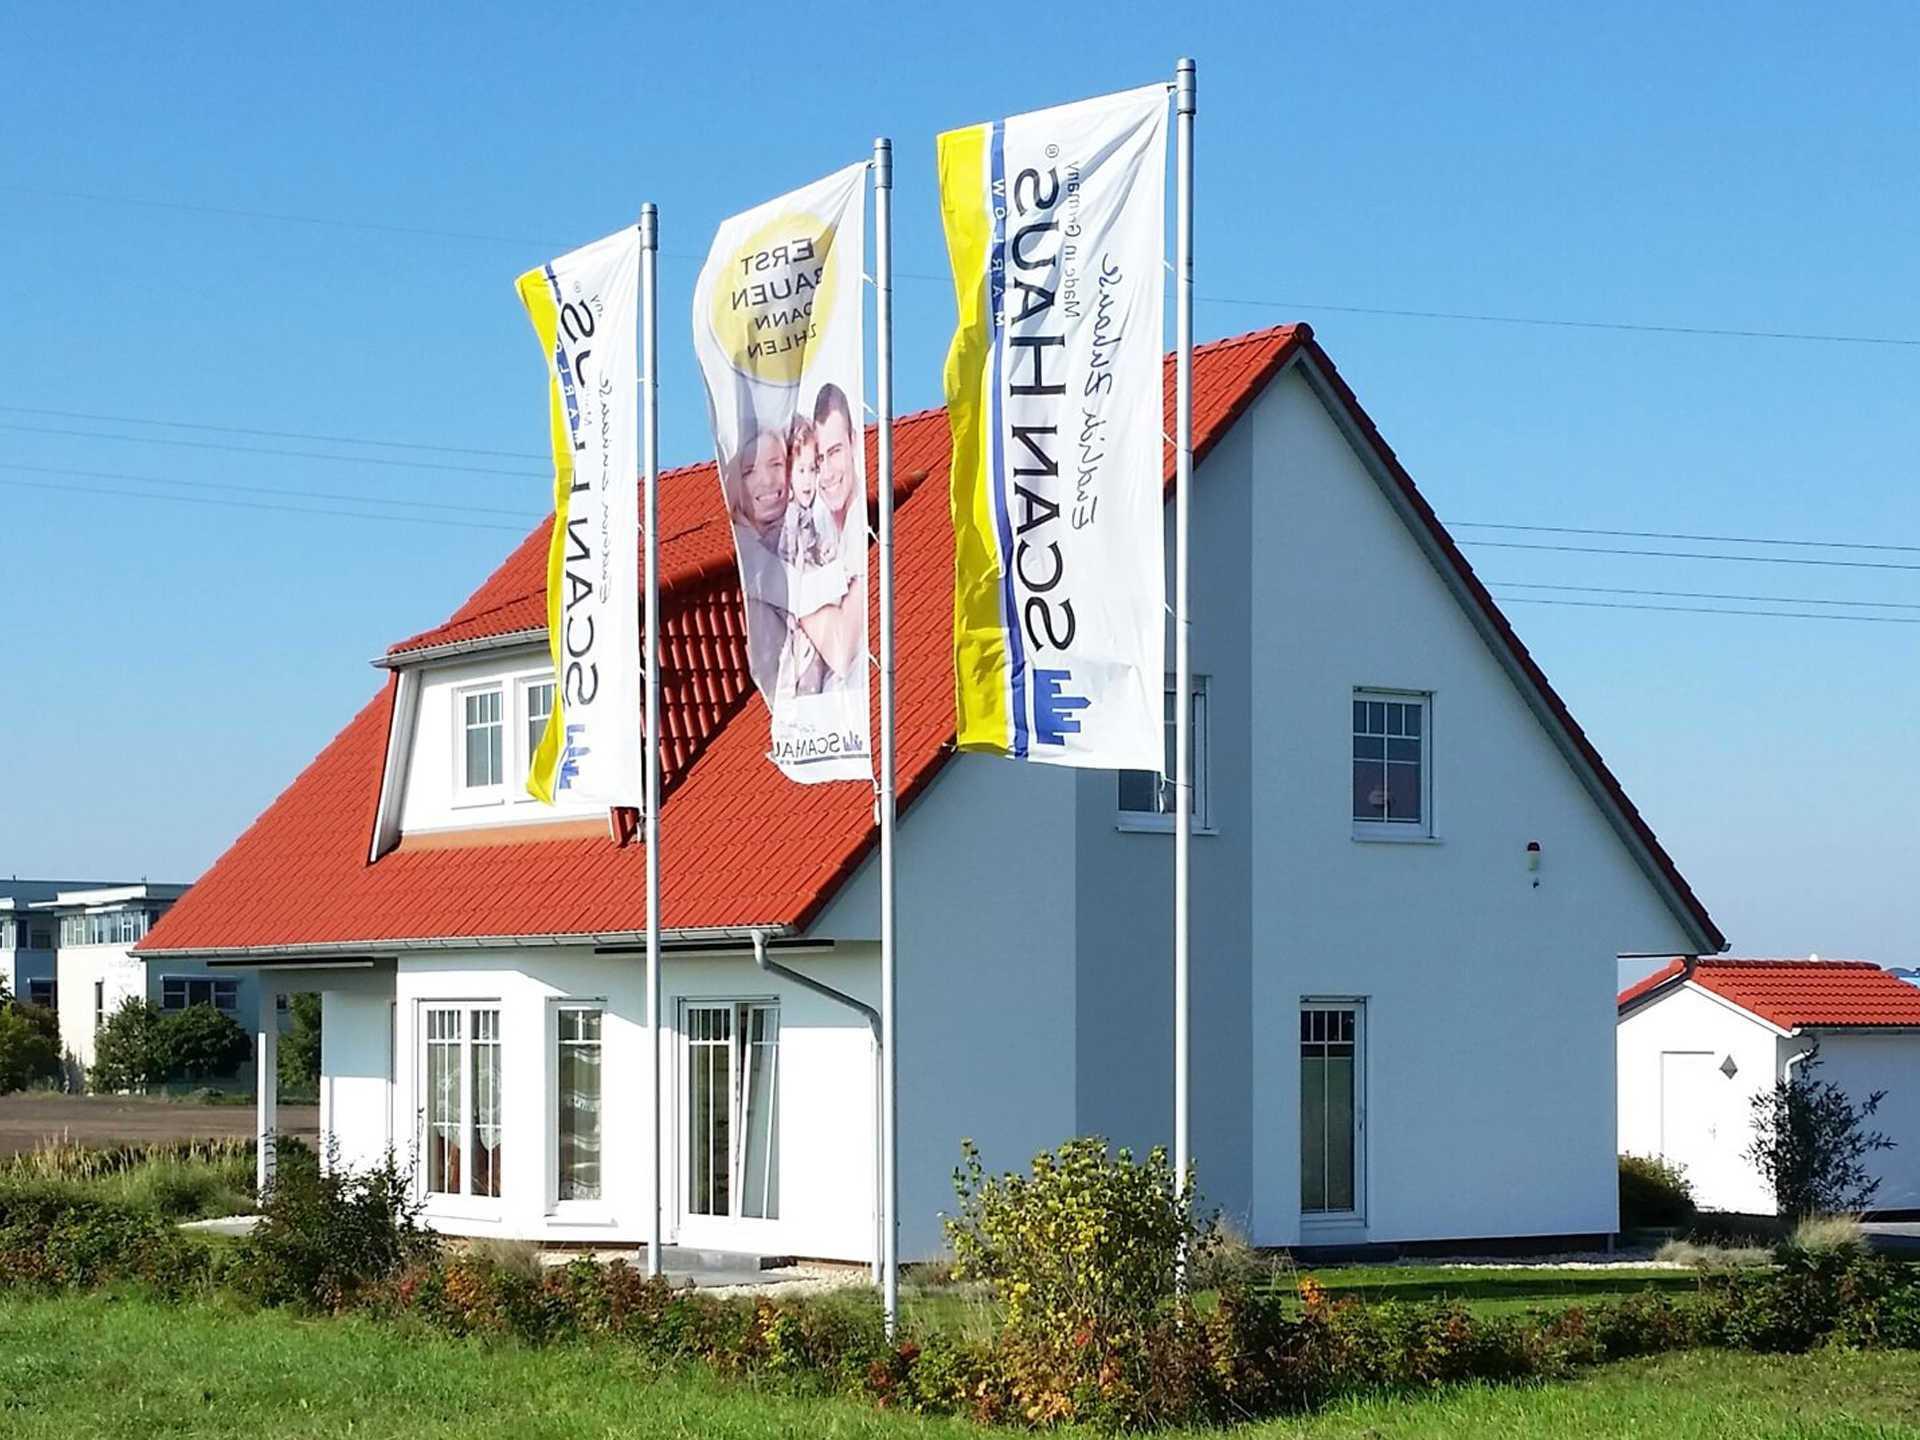 musterhausausstellung unger park leipzig. Black Bedroom Furniture Sets. Home Design Ideas